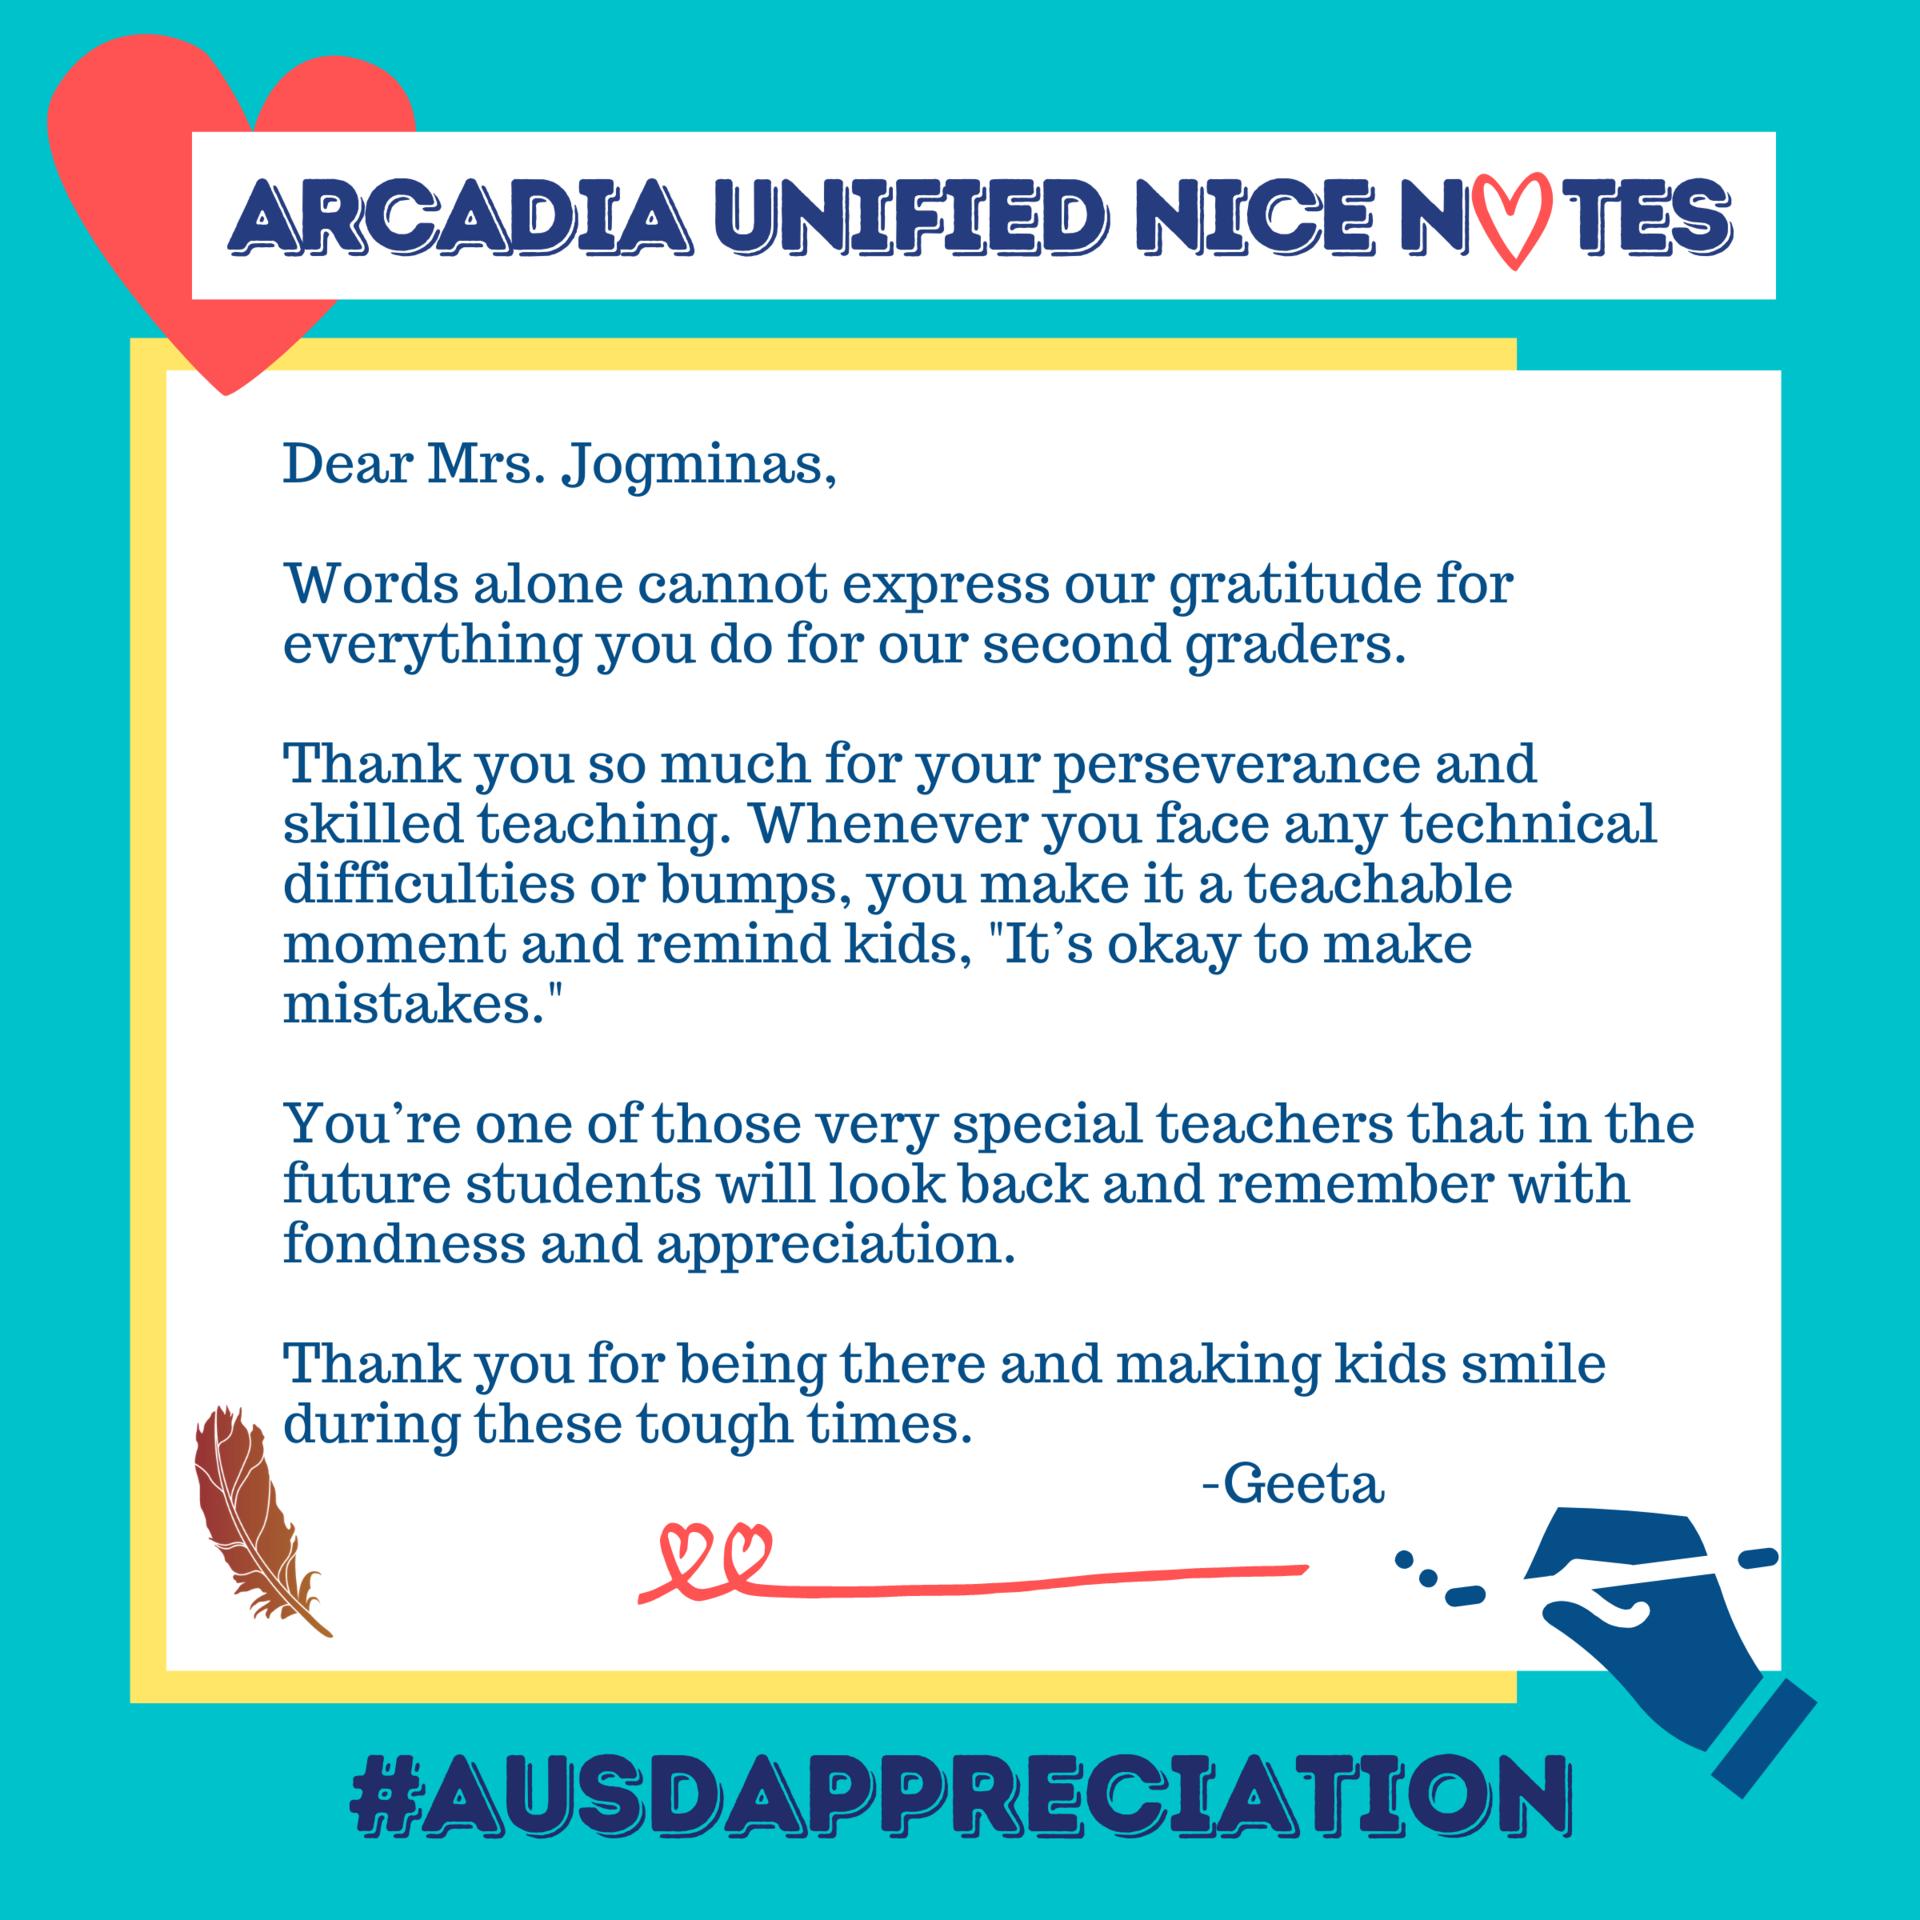 Arcadia Unified Nice Note Image